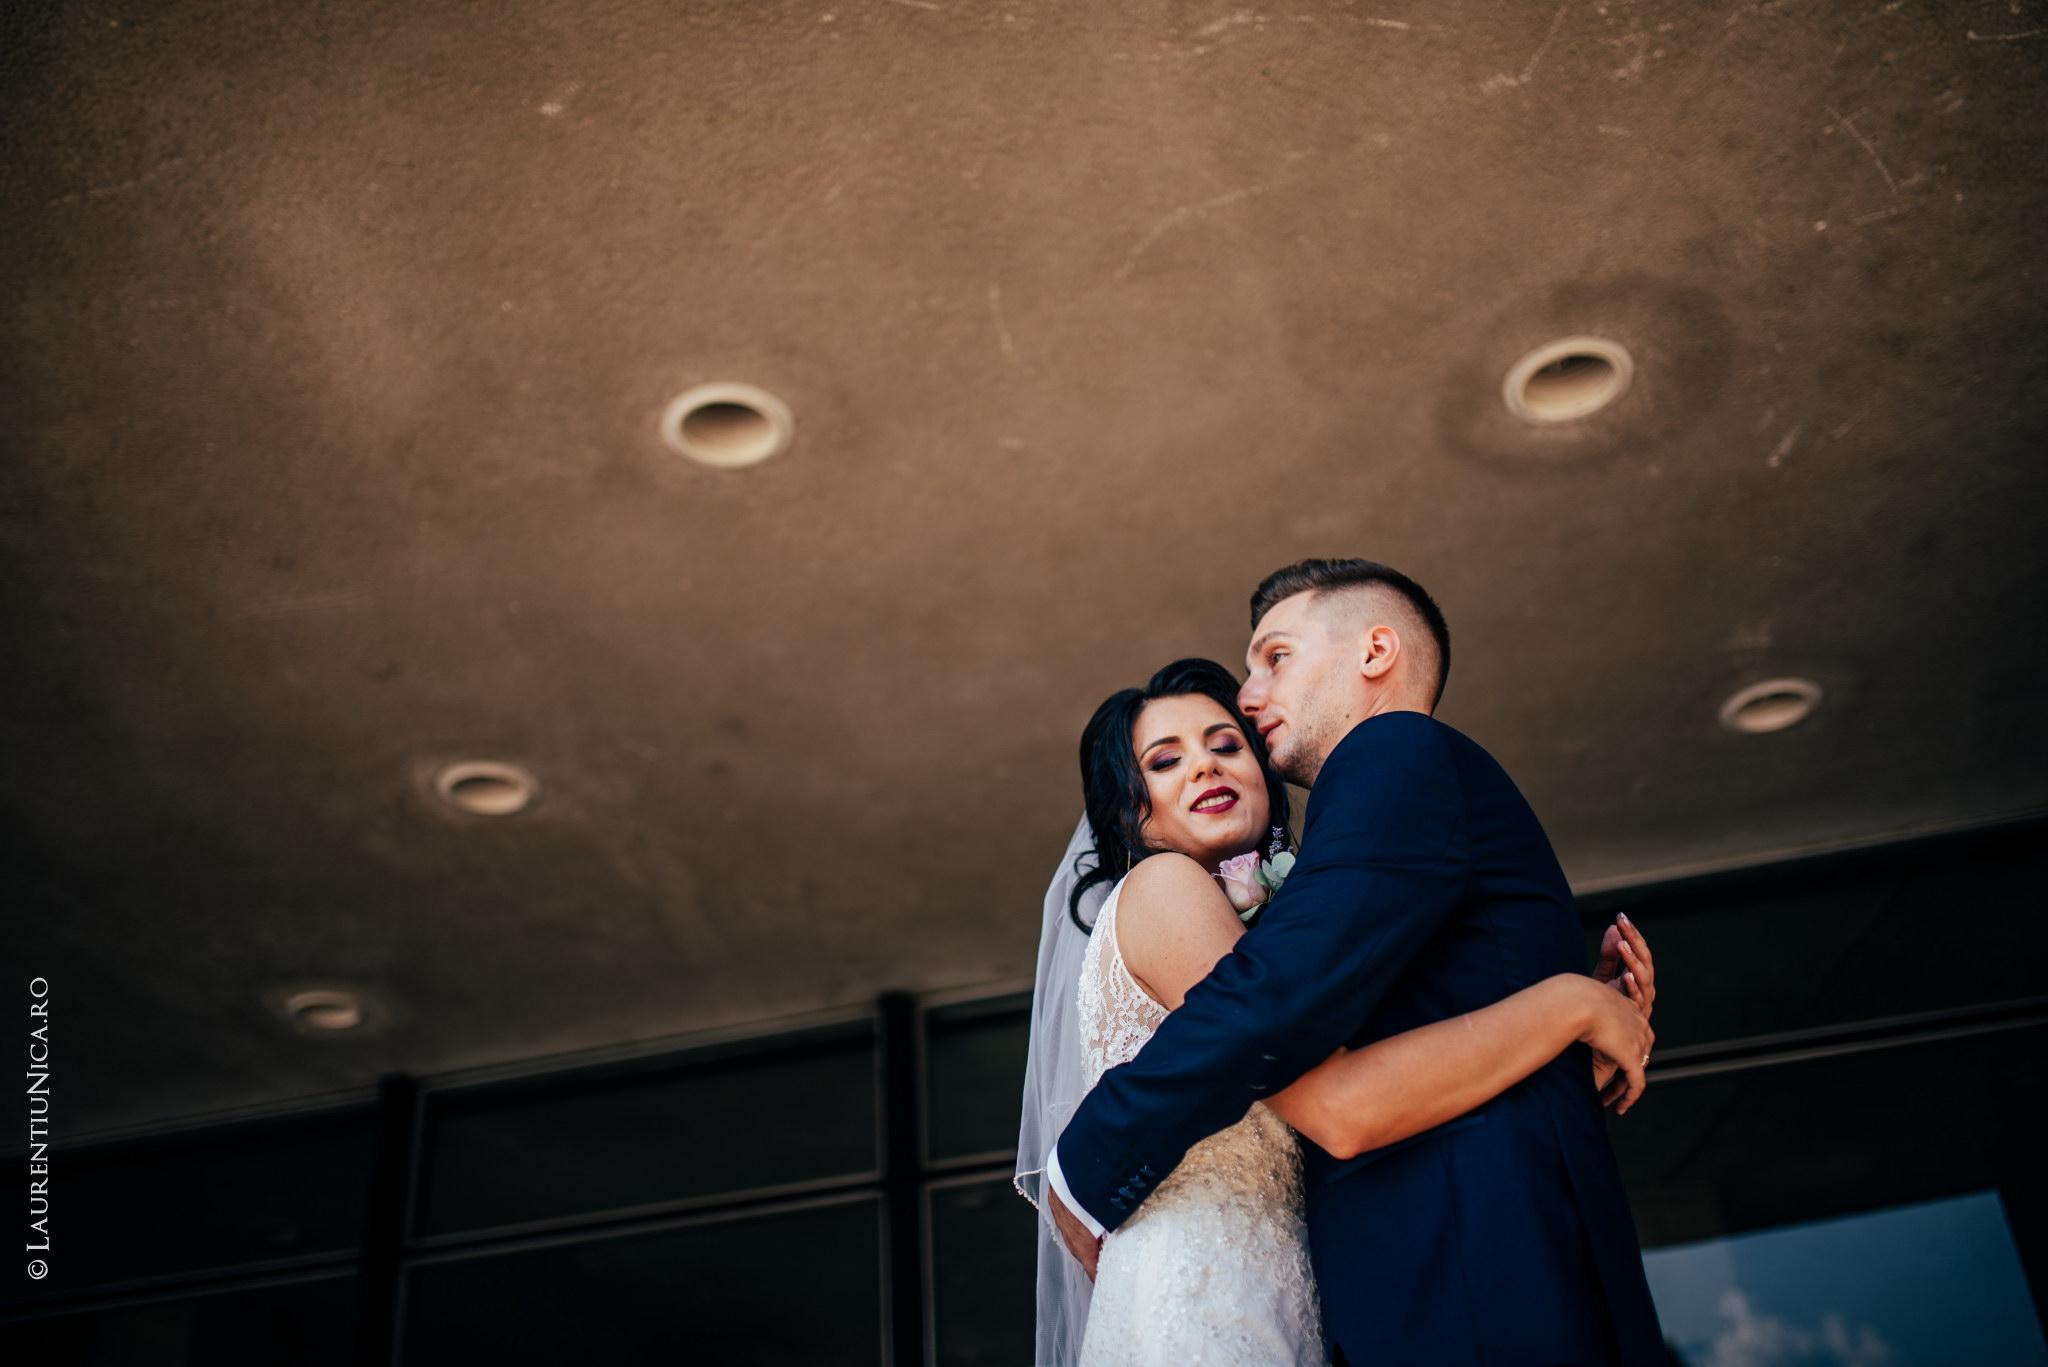 fotografii nunta craiova bia alex fotograf nunta laurentiu nica 28 - Bia & Alex | Fotografii nunta | Craiova